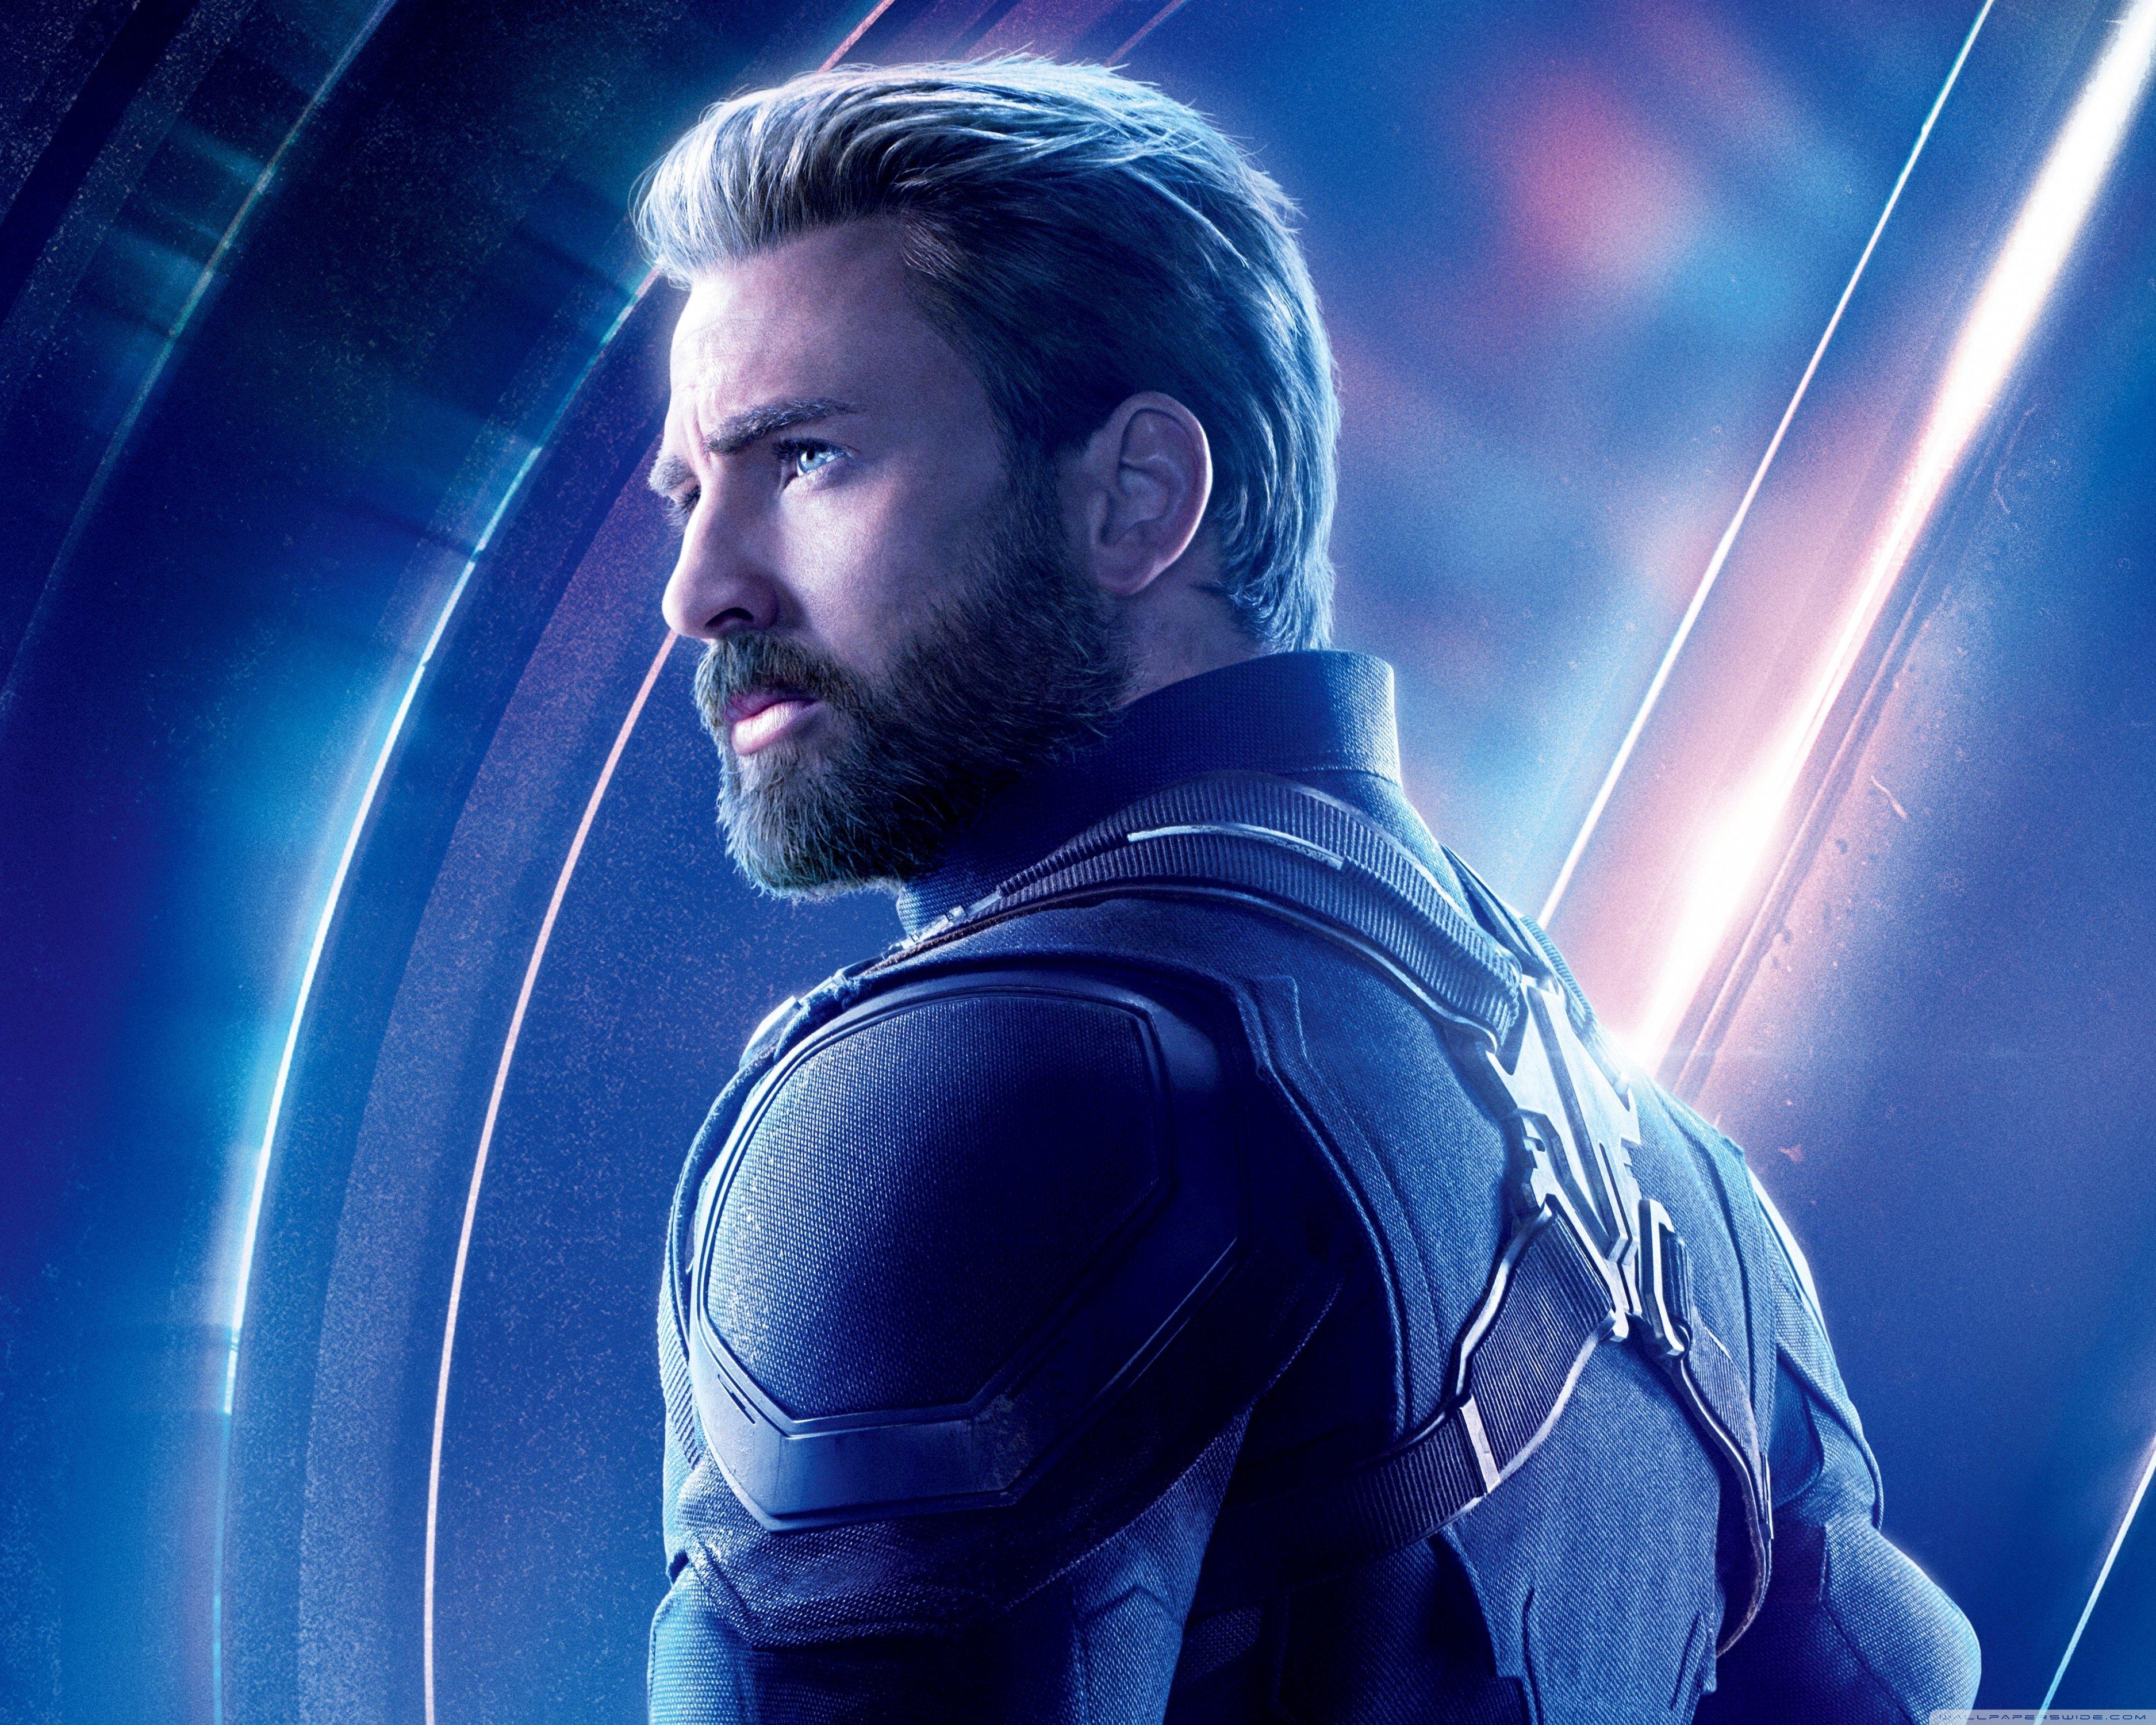 Avengers Infinity War 2018 Movie Captain America 4K HD Desktop 3750x3000